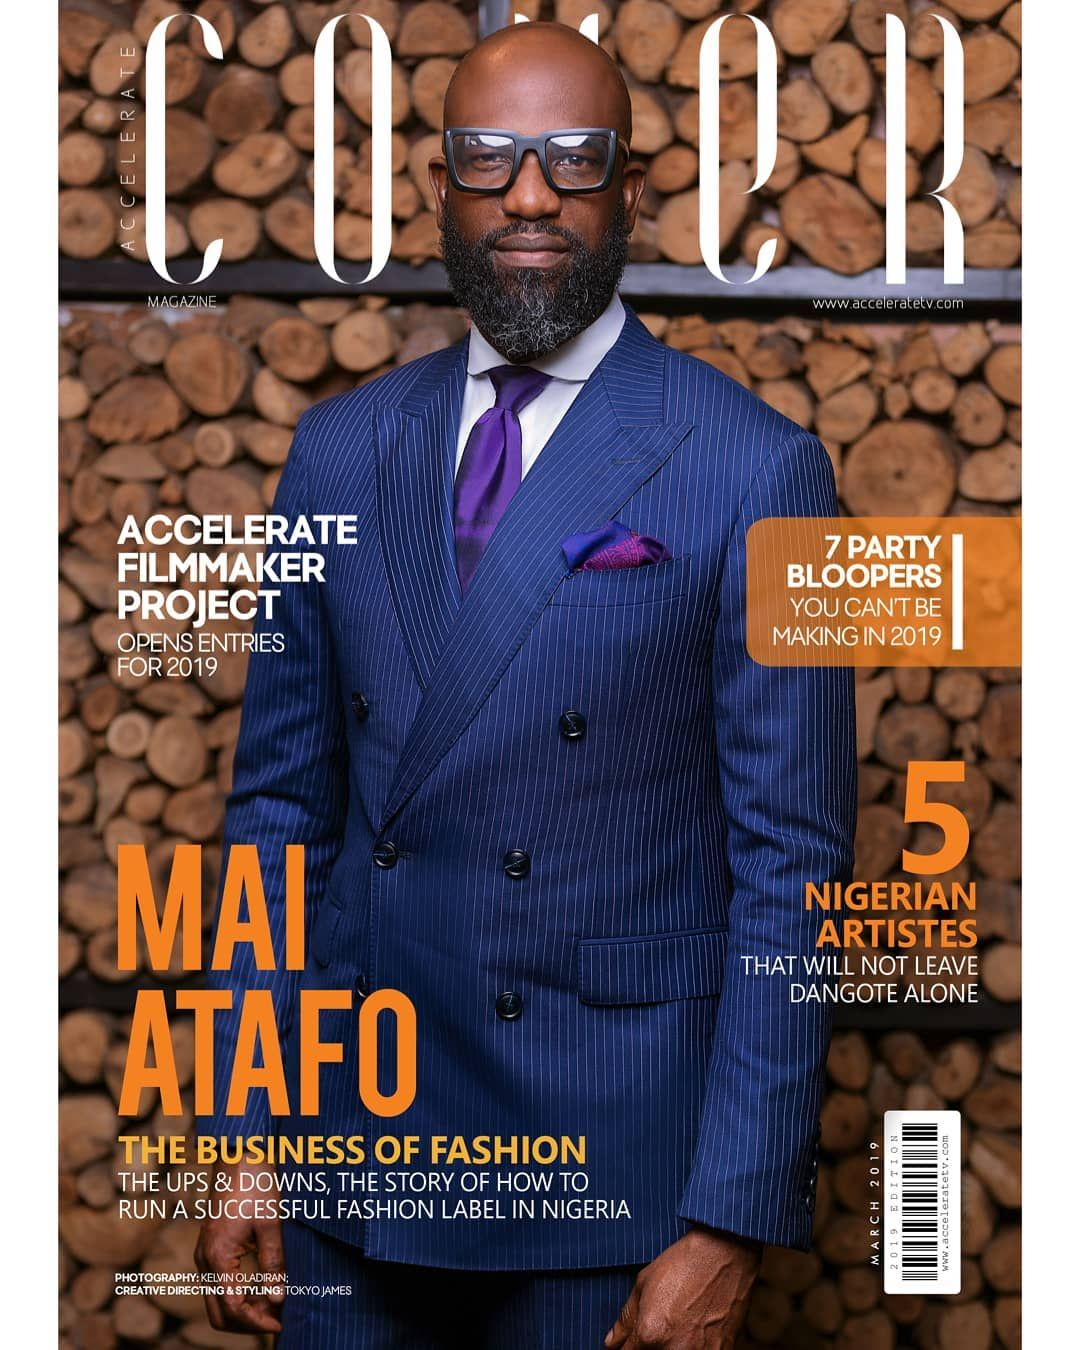 Mai Atafo Talks Running A Successful Fashion Brand In Nigeria In The Cover Magazines Latest Issue Fashion Fashion Brand Fashion Labels